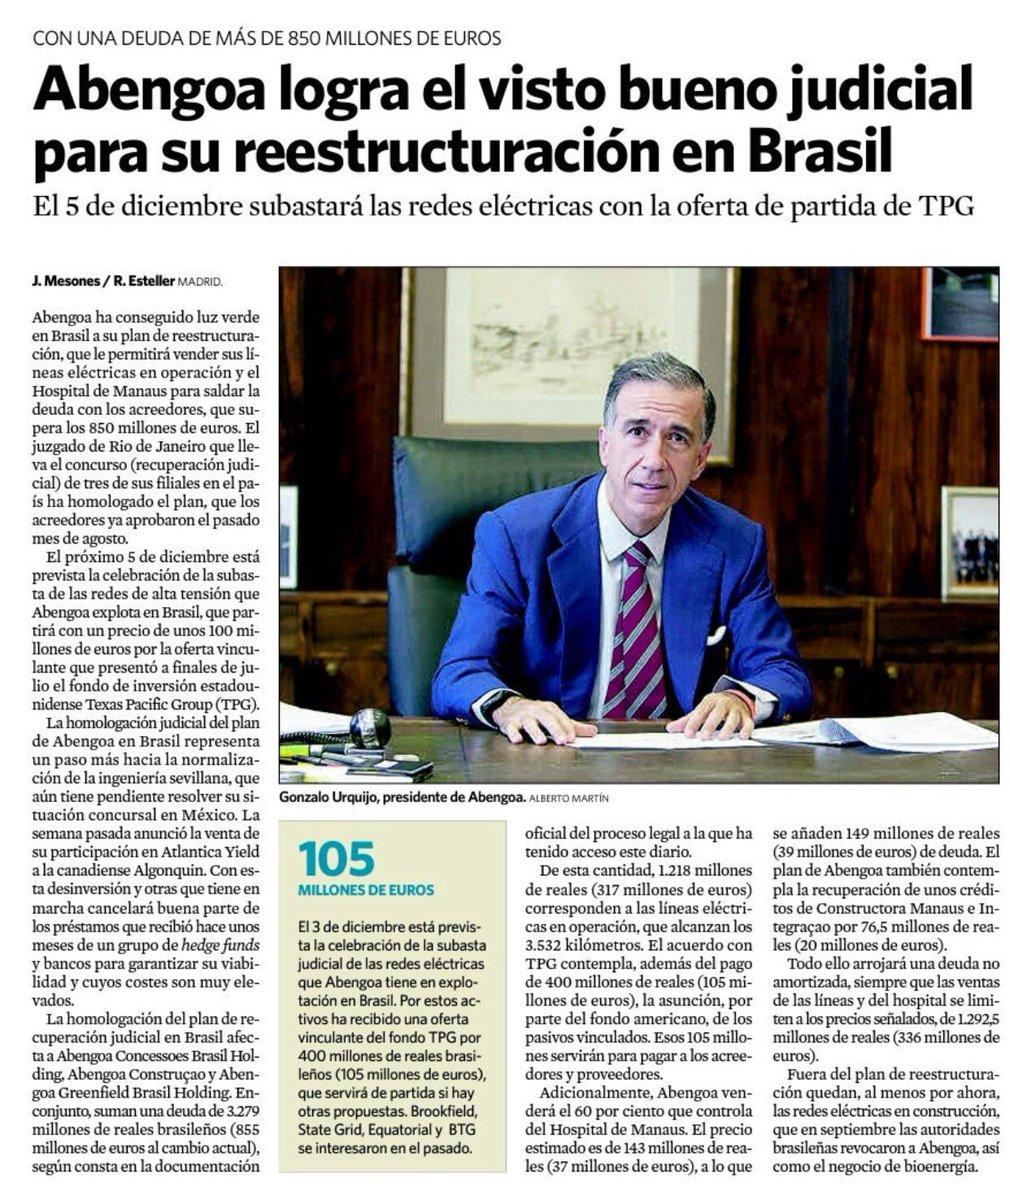 FORO DE ABENGOA  - Página 4 DOkfpDhX0AY9RUp